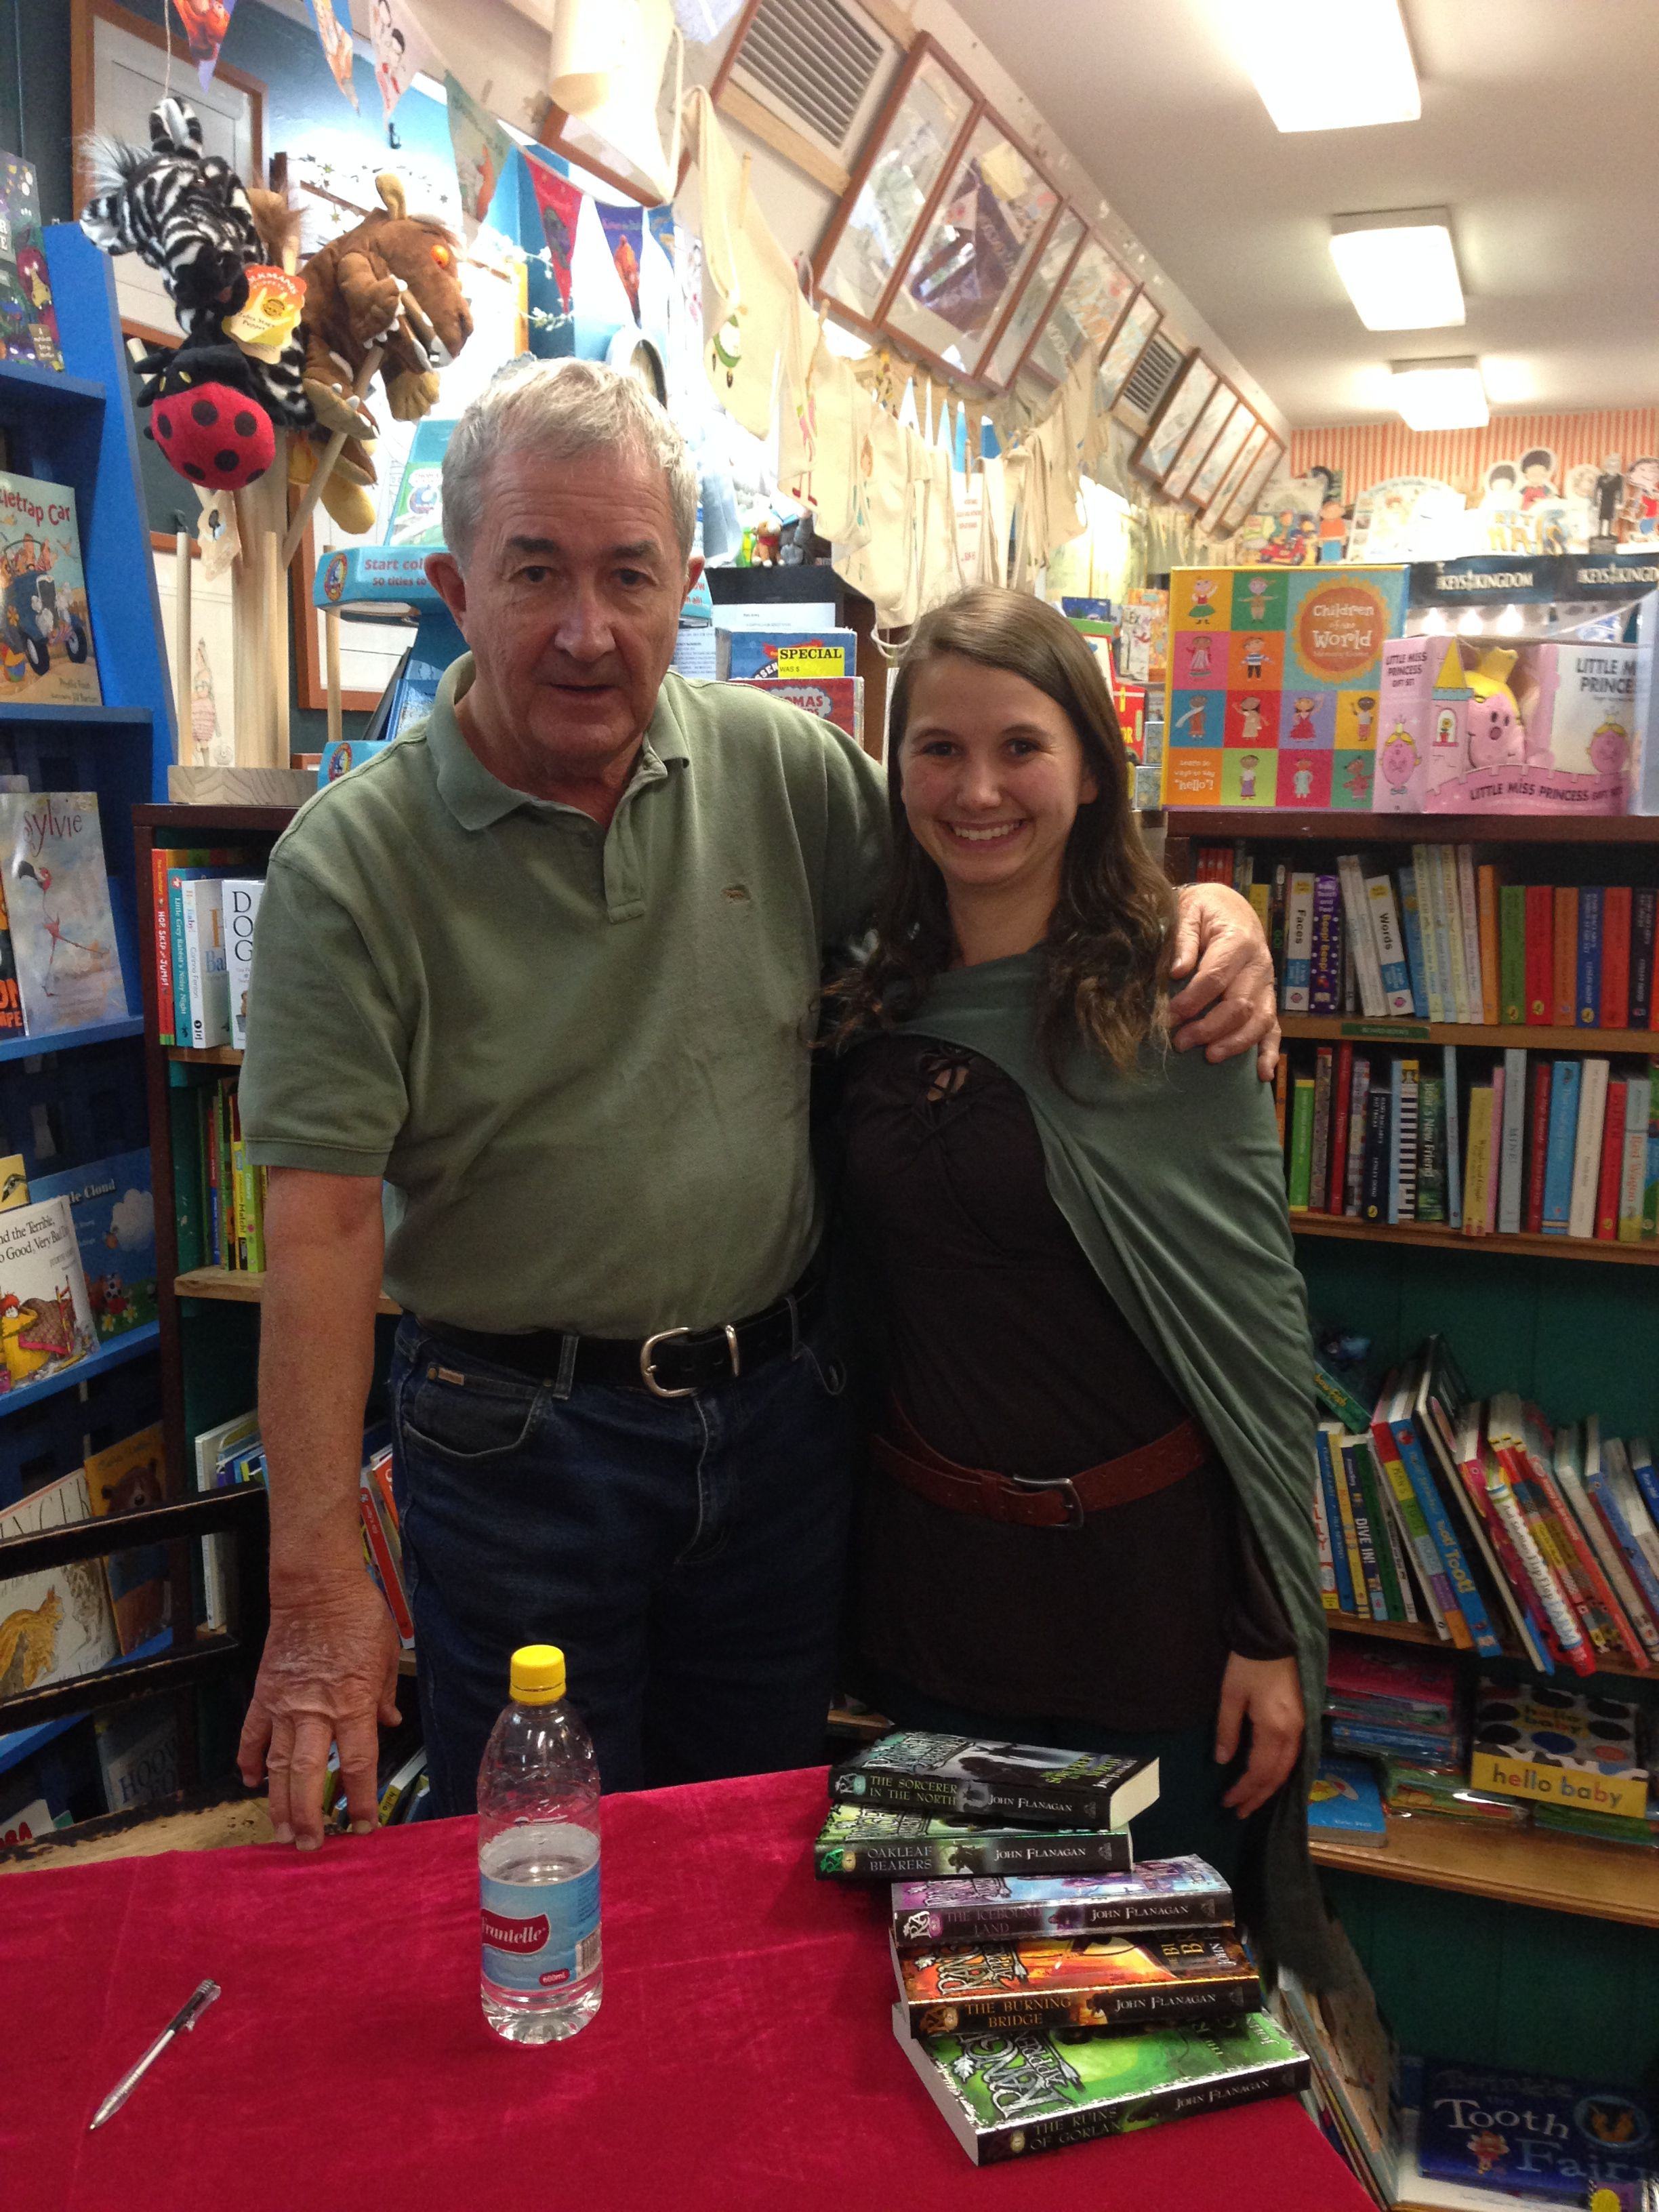 John Flanagan the author of Rangers' Apprentice